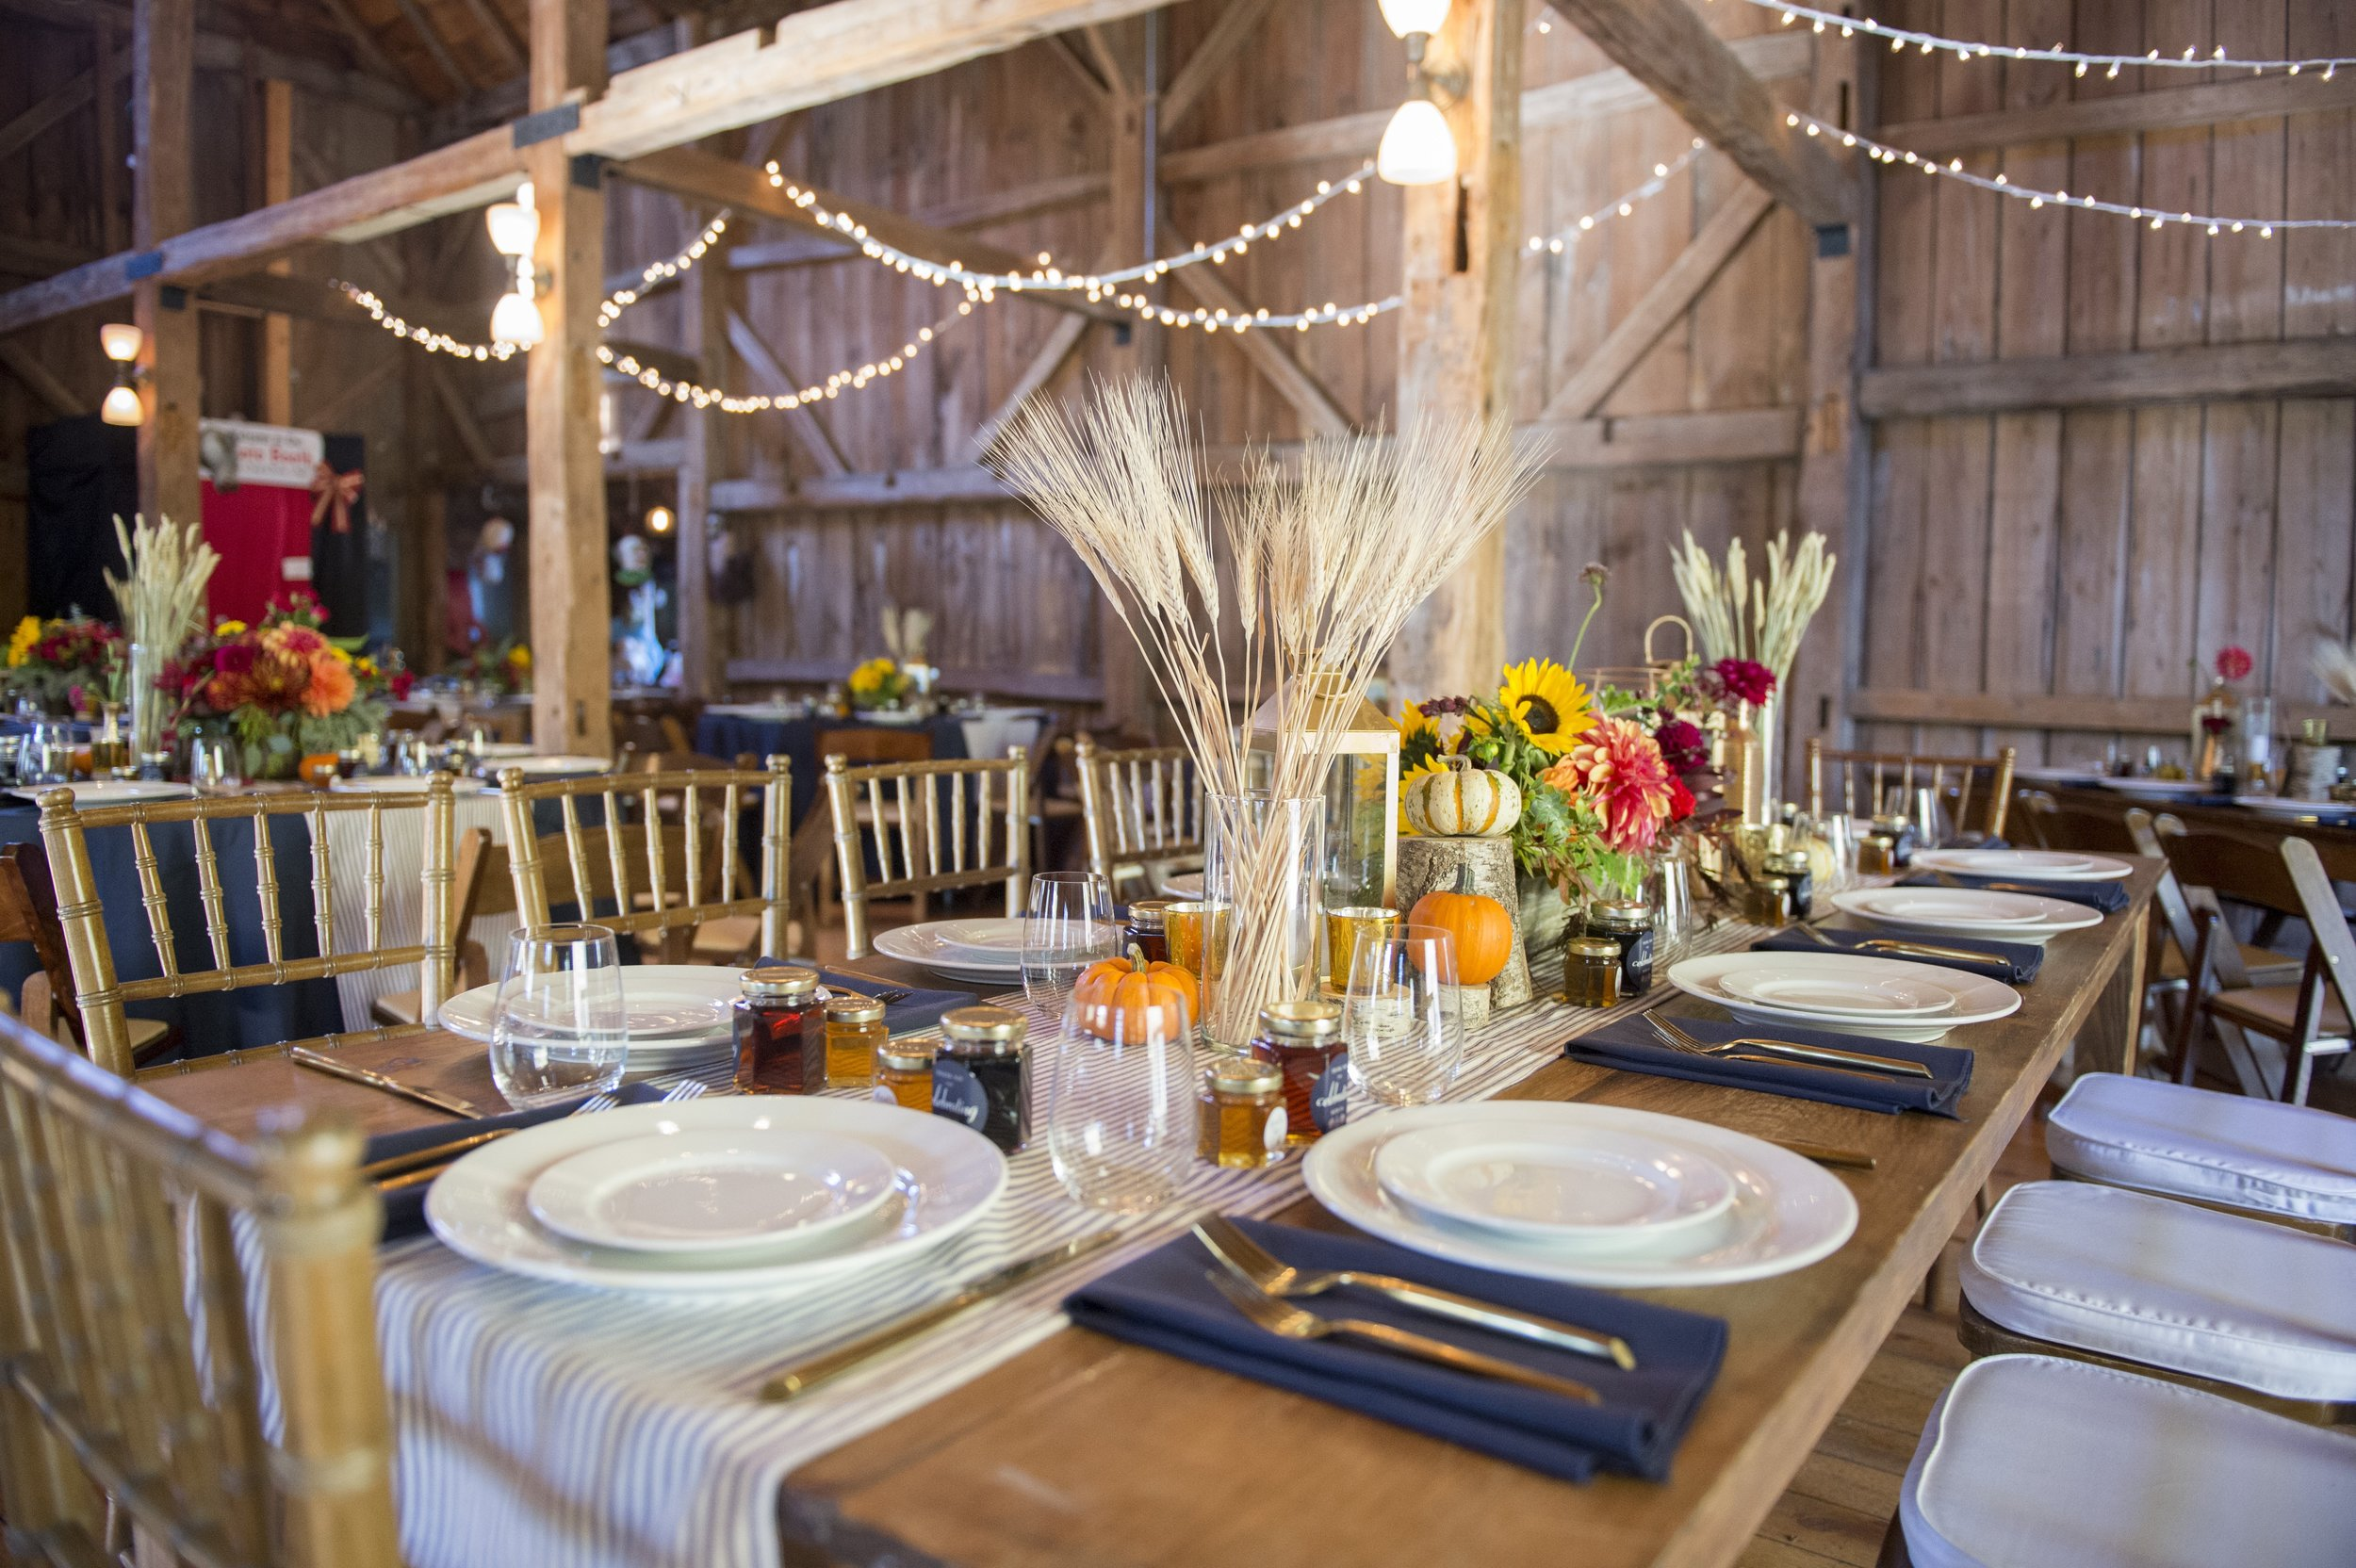 Maine Seasons Events Autumn barn wedding by Jordan Moody for Brea Mcdonald